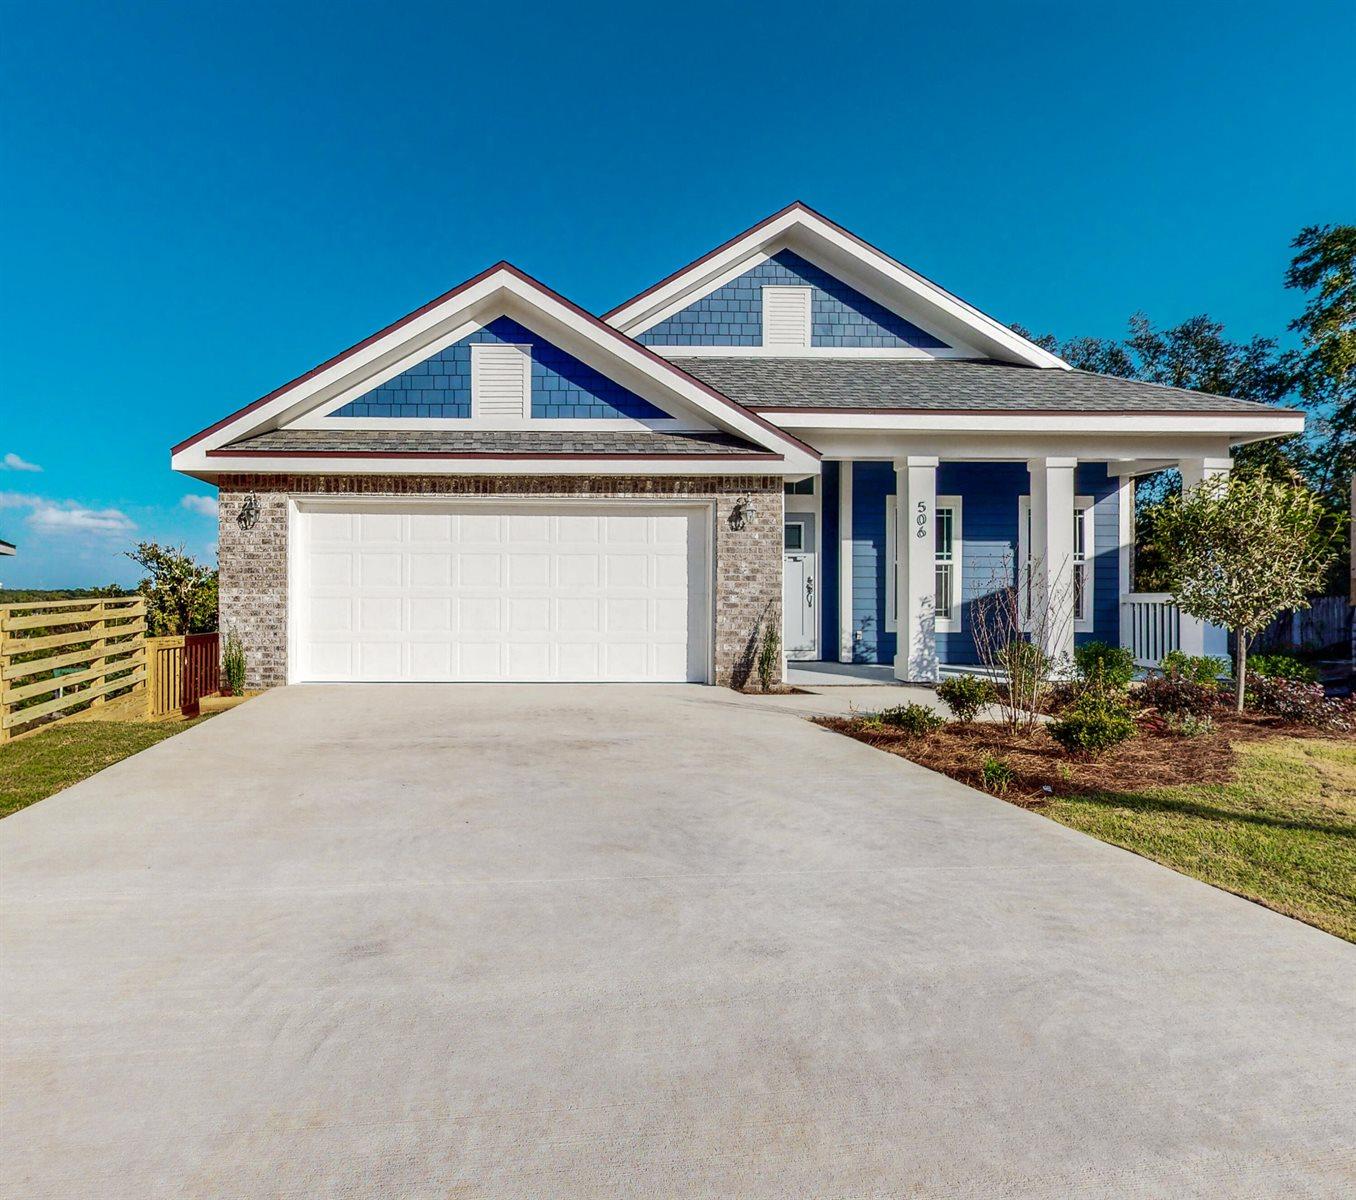 510 Harborview Circle, Niceville, FL 32578